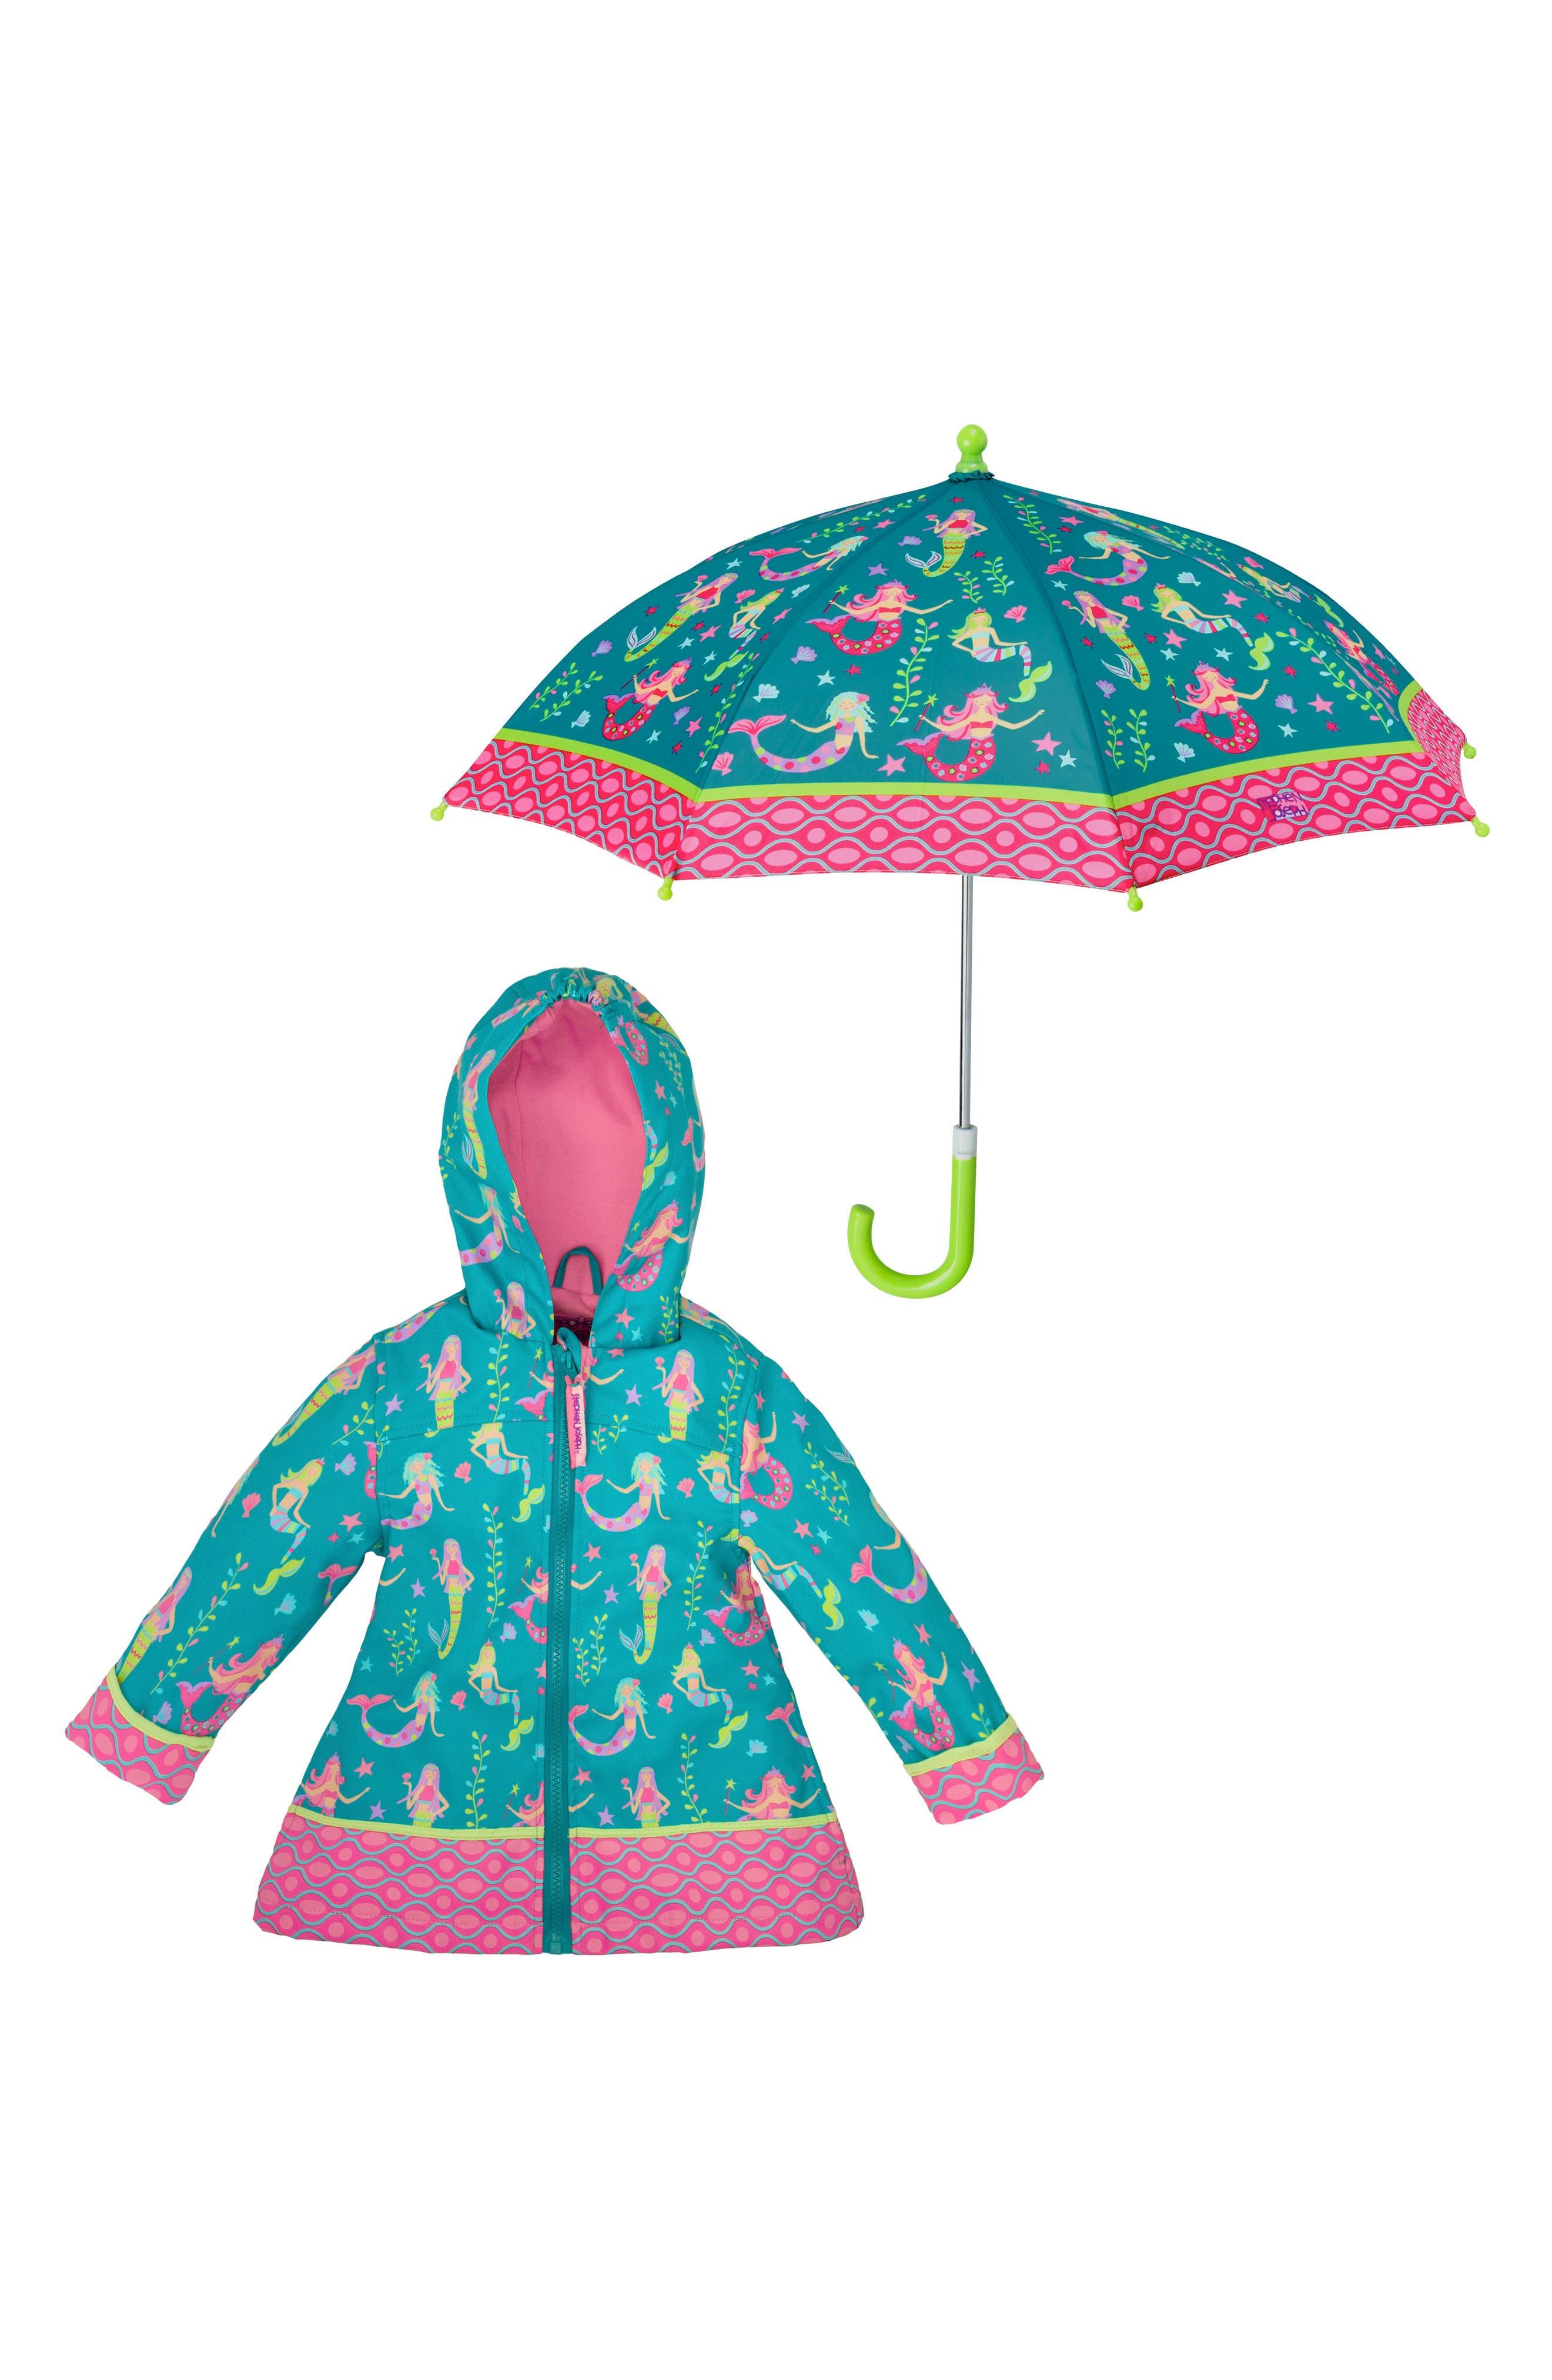 Mermaid Raincoat & Umbrella Set,                             Main thumbnail 1, color,                             MERMAID